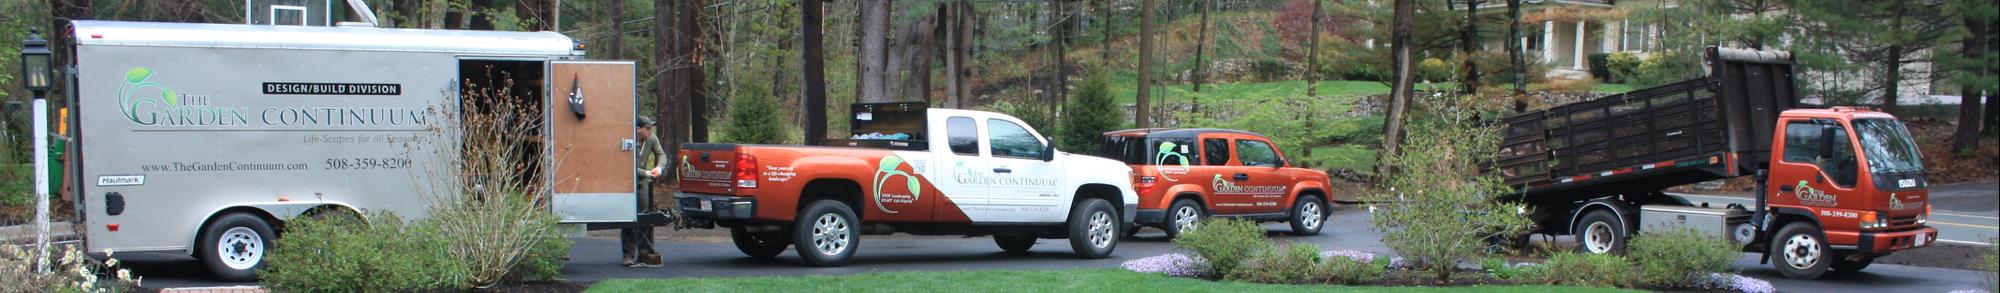 tgc-fine-gardening-fleet.png